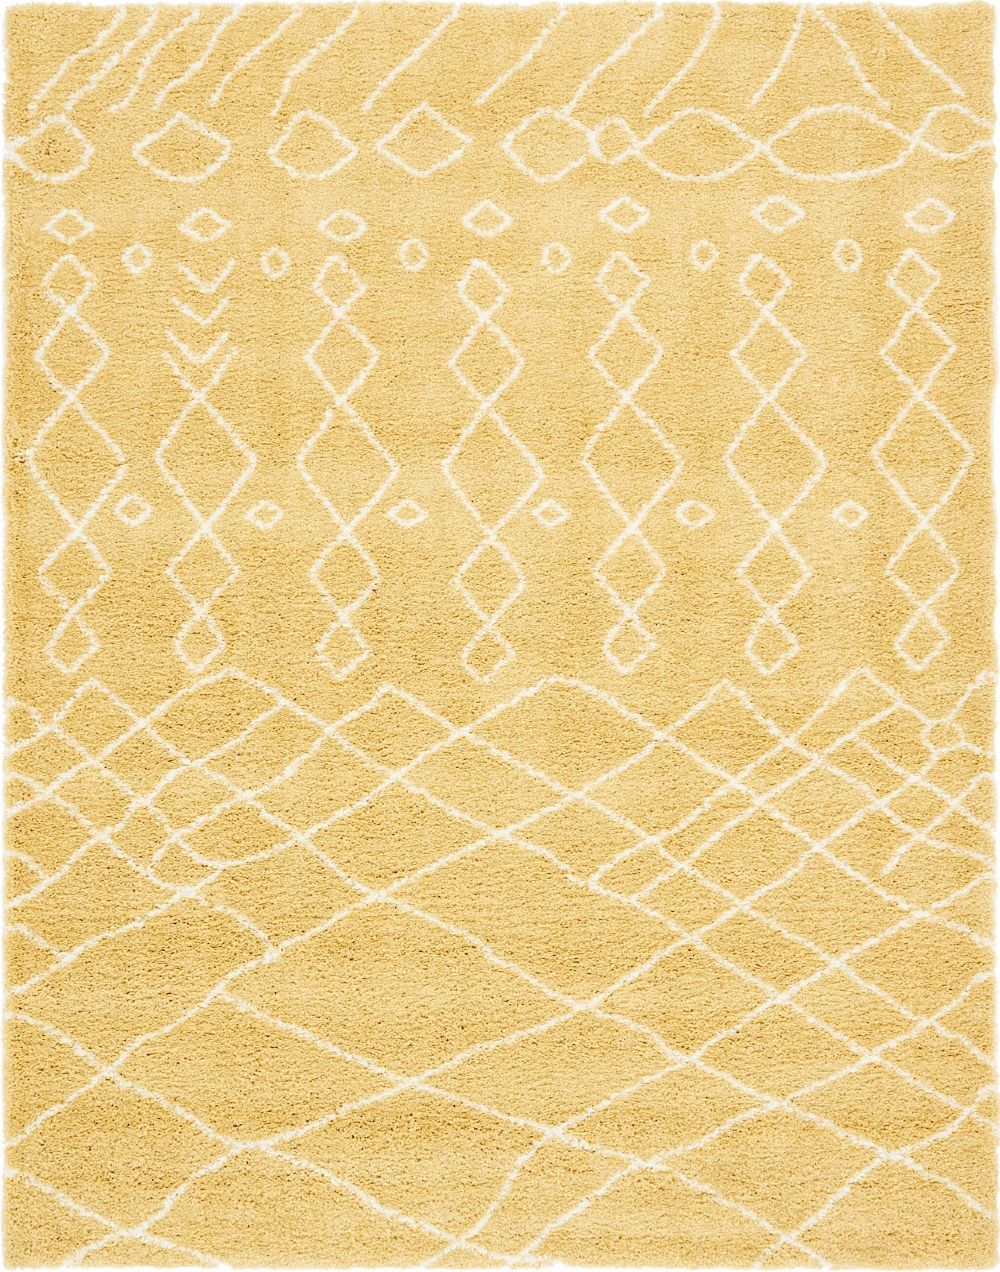 unique loom rabat shag shag area rug collection